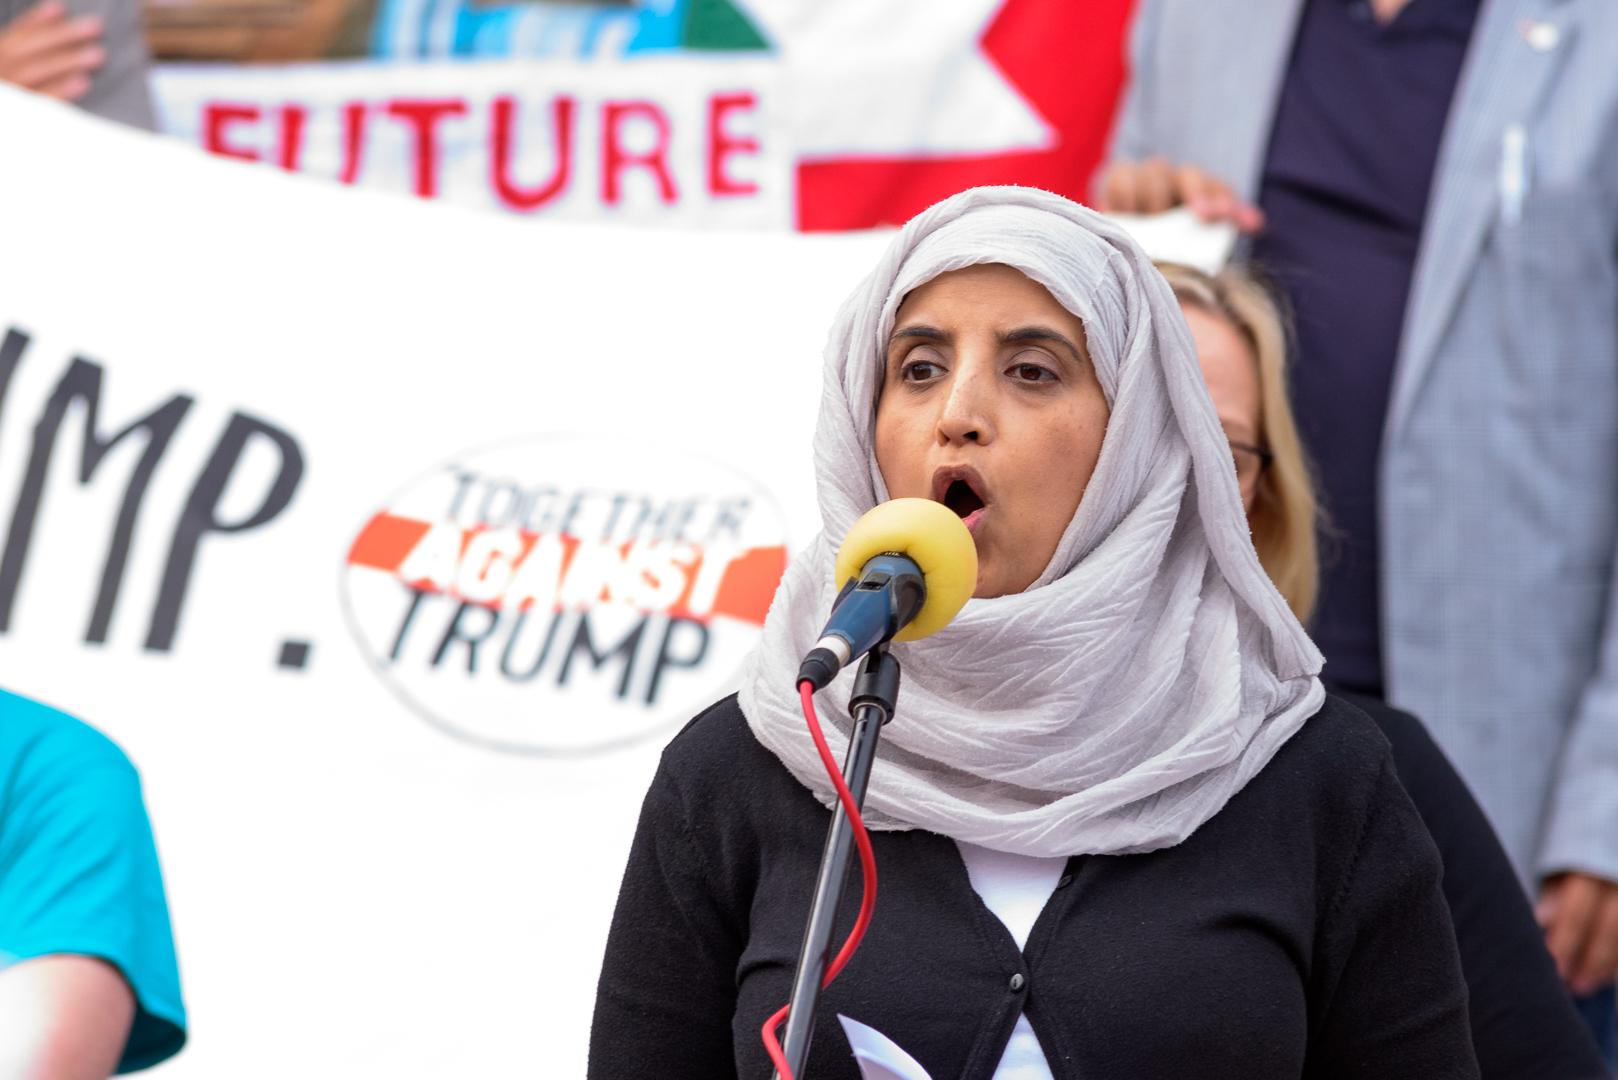 Sheffield Anti-Trump rally July 2018 Blog39.jpg